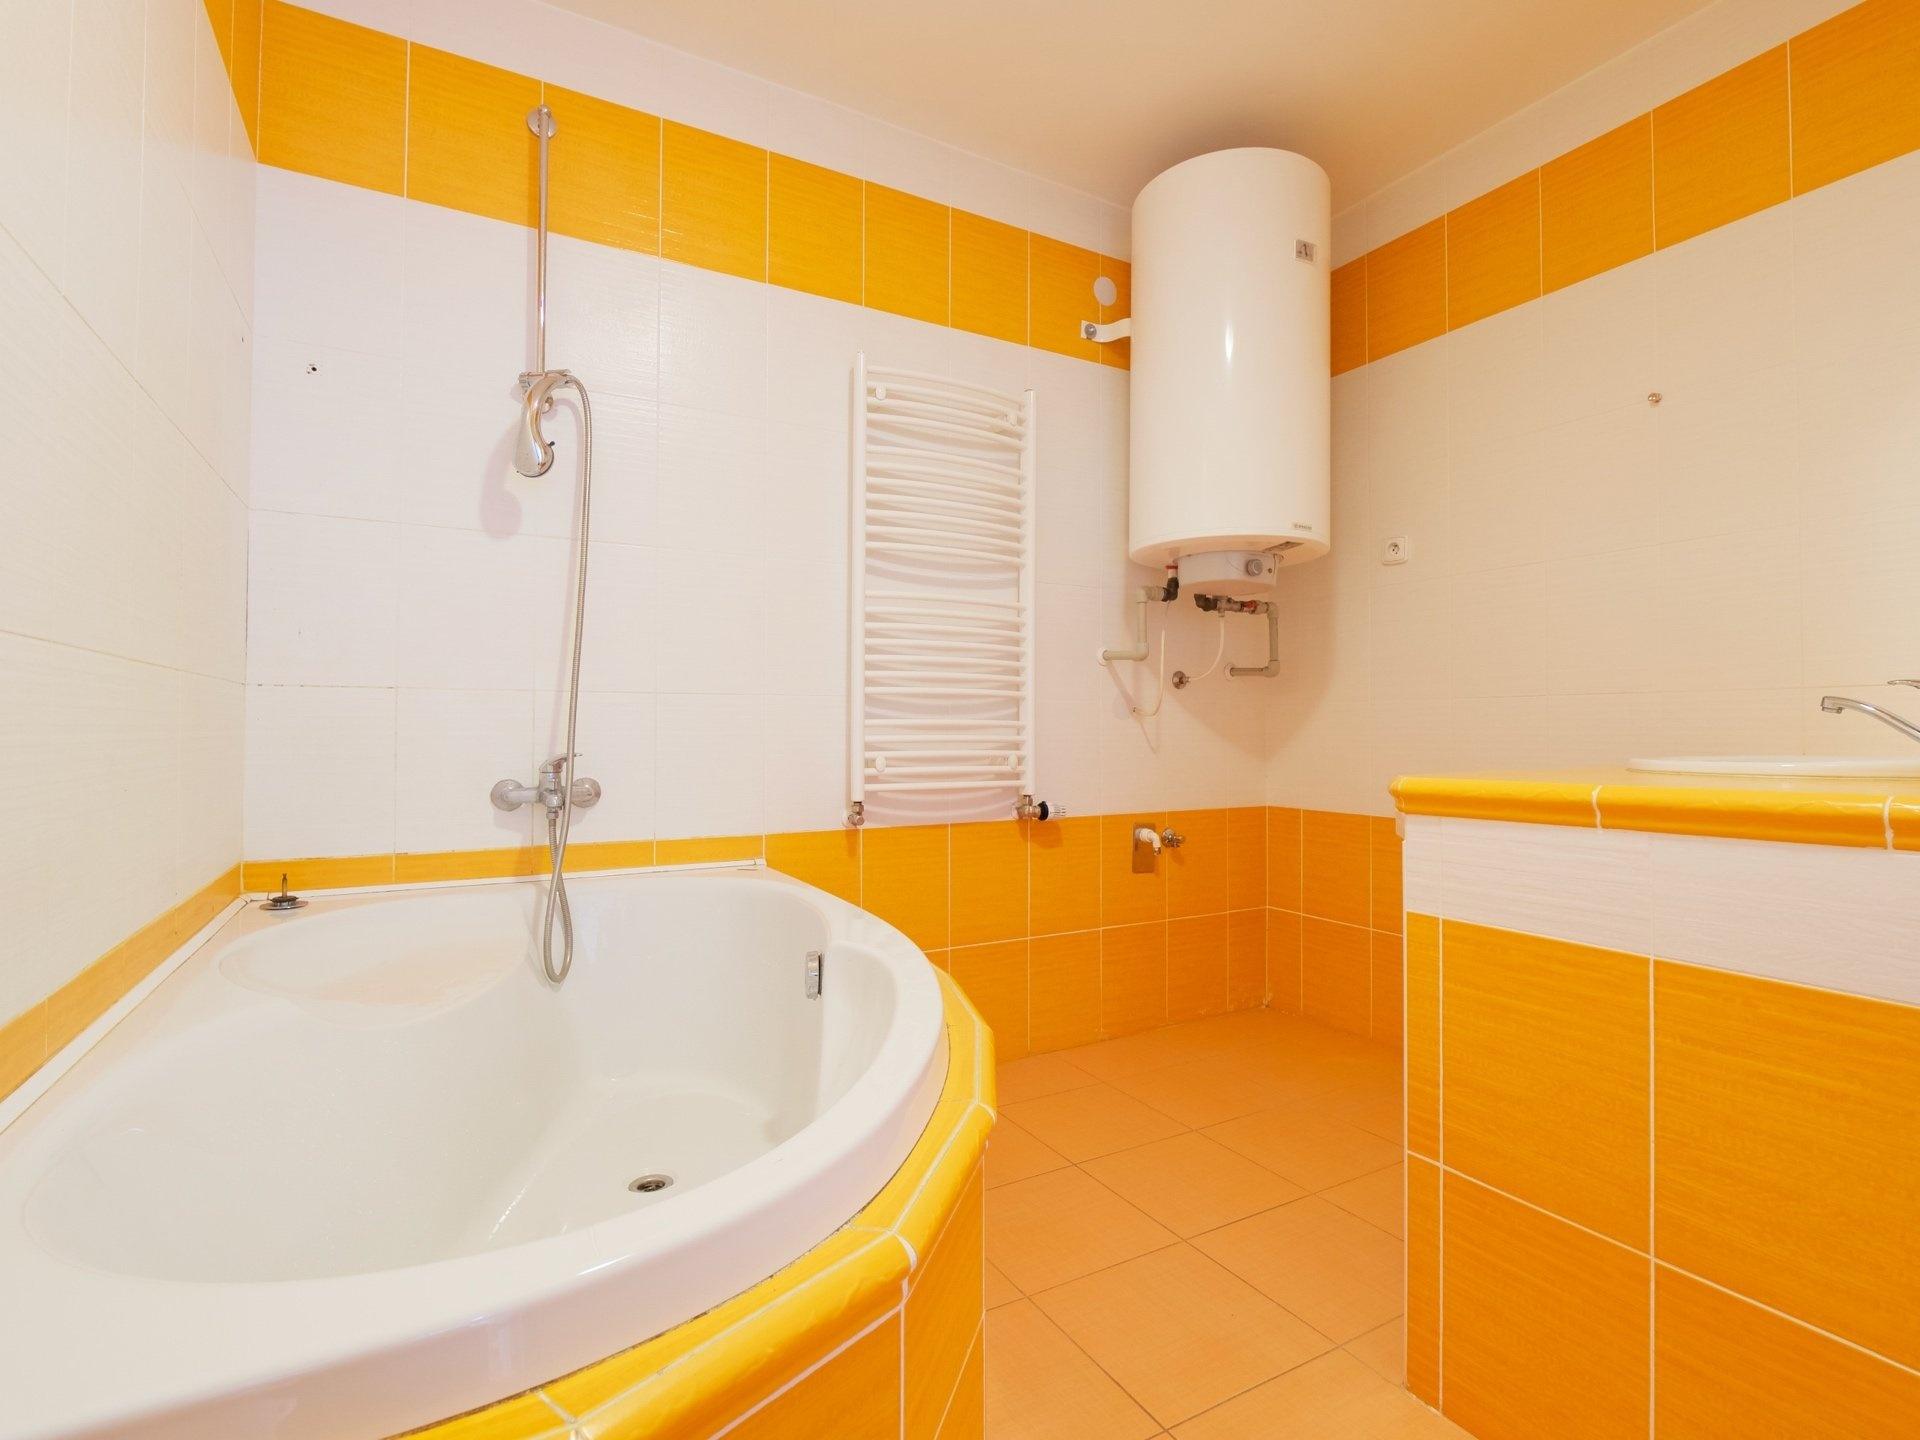 prodej-rodinneho-domu-letohrad-p1210759-6e08c4